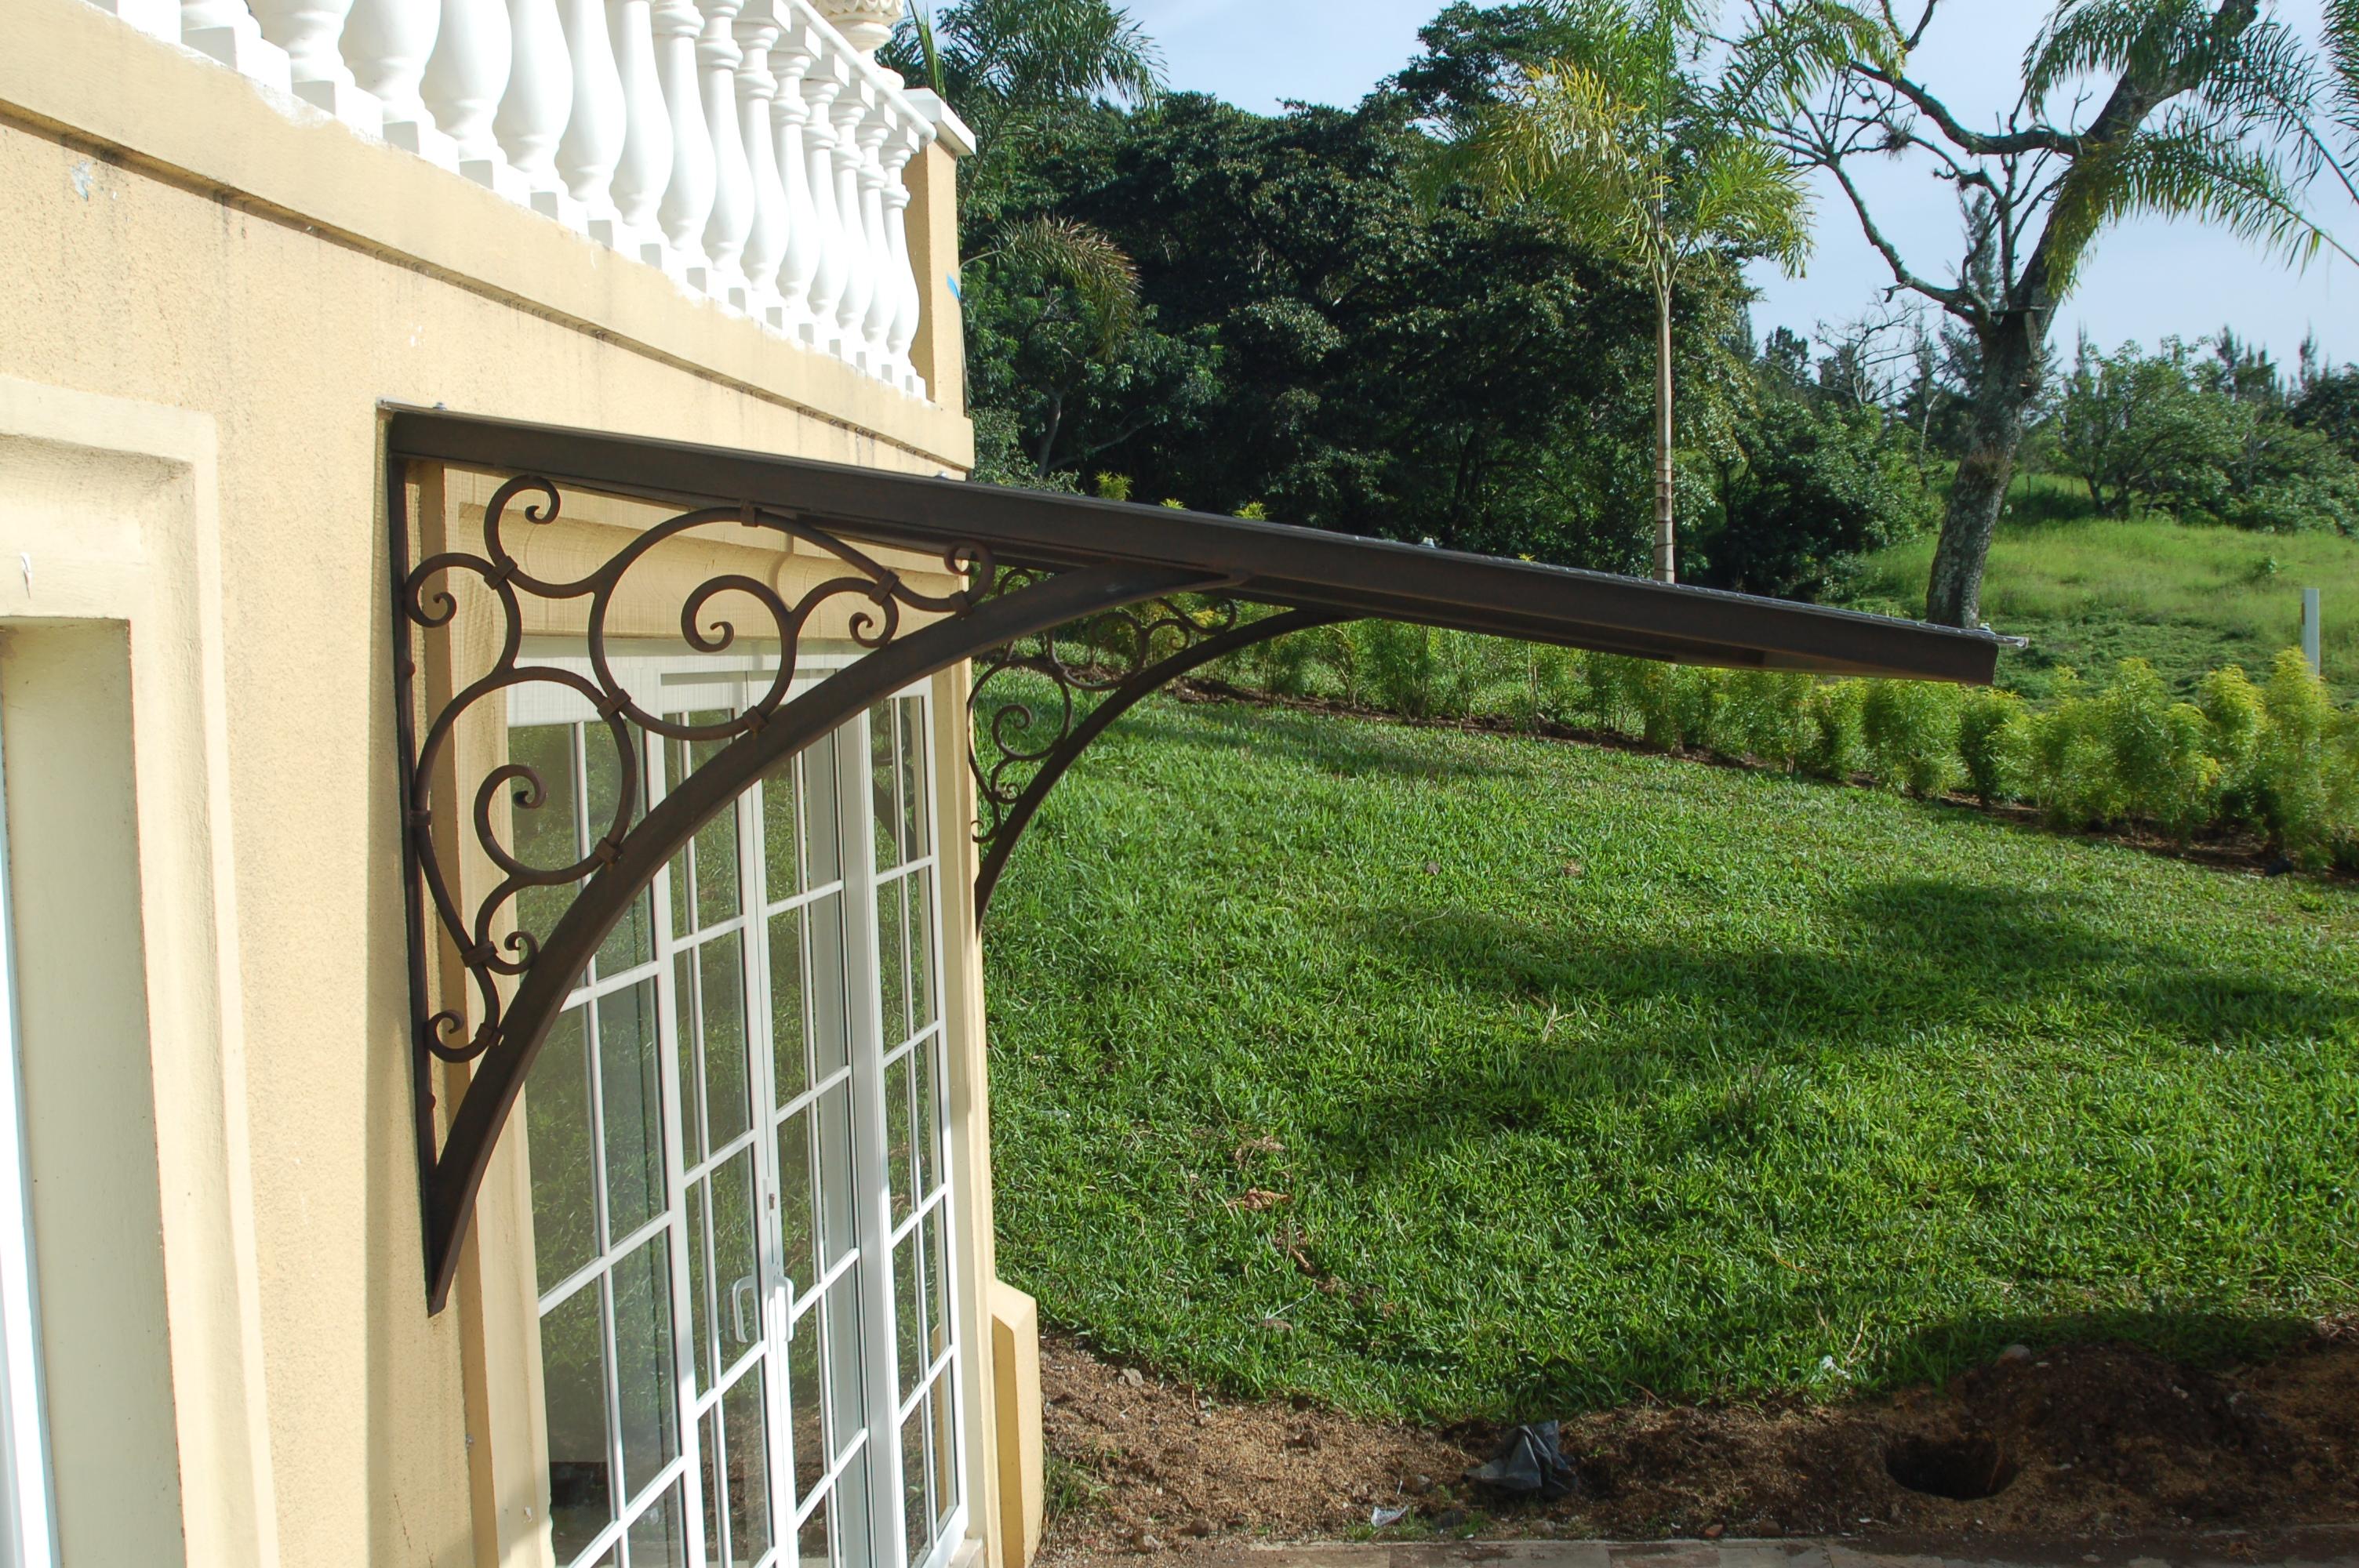 Detalle de pie para soporte de techo sobre ventana